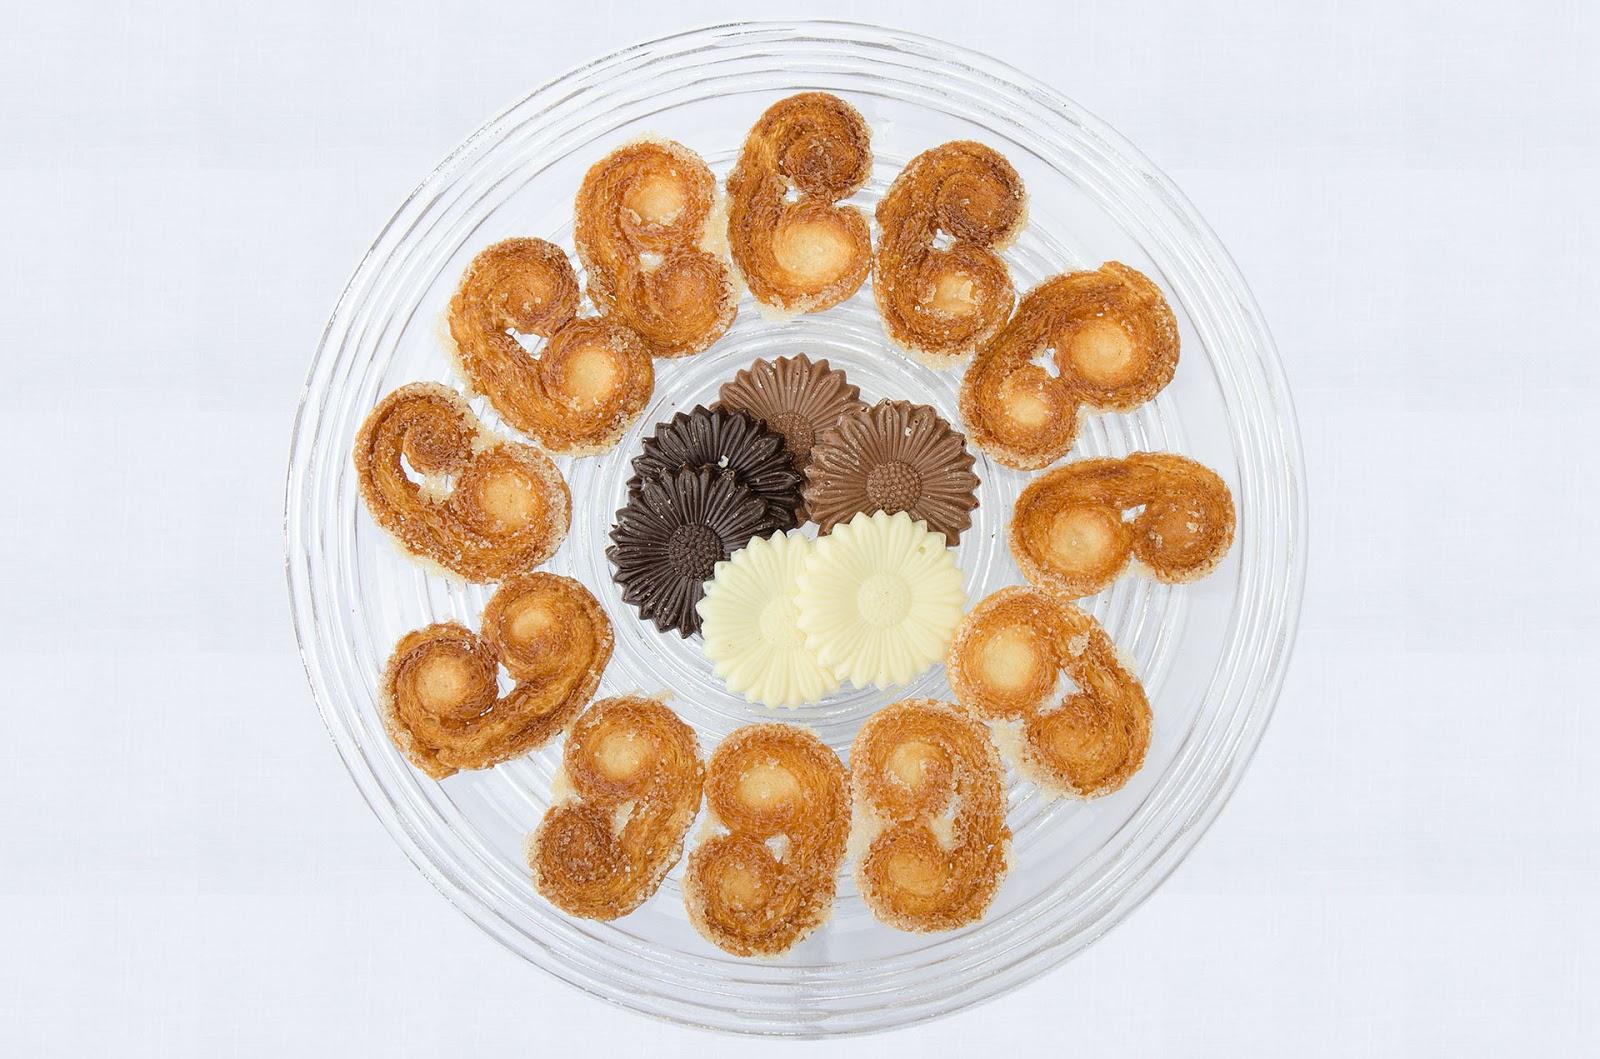 receta-palmeritas-hojaldre-pastas-azucar-dulces-facil-postres-bruja